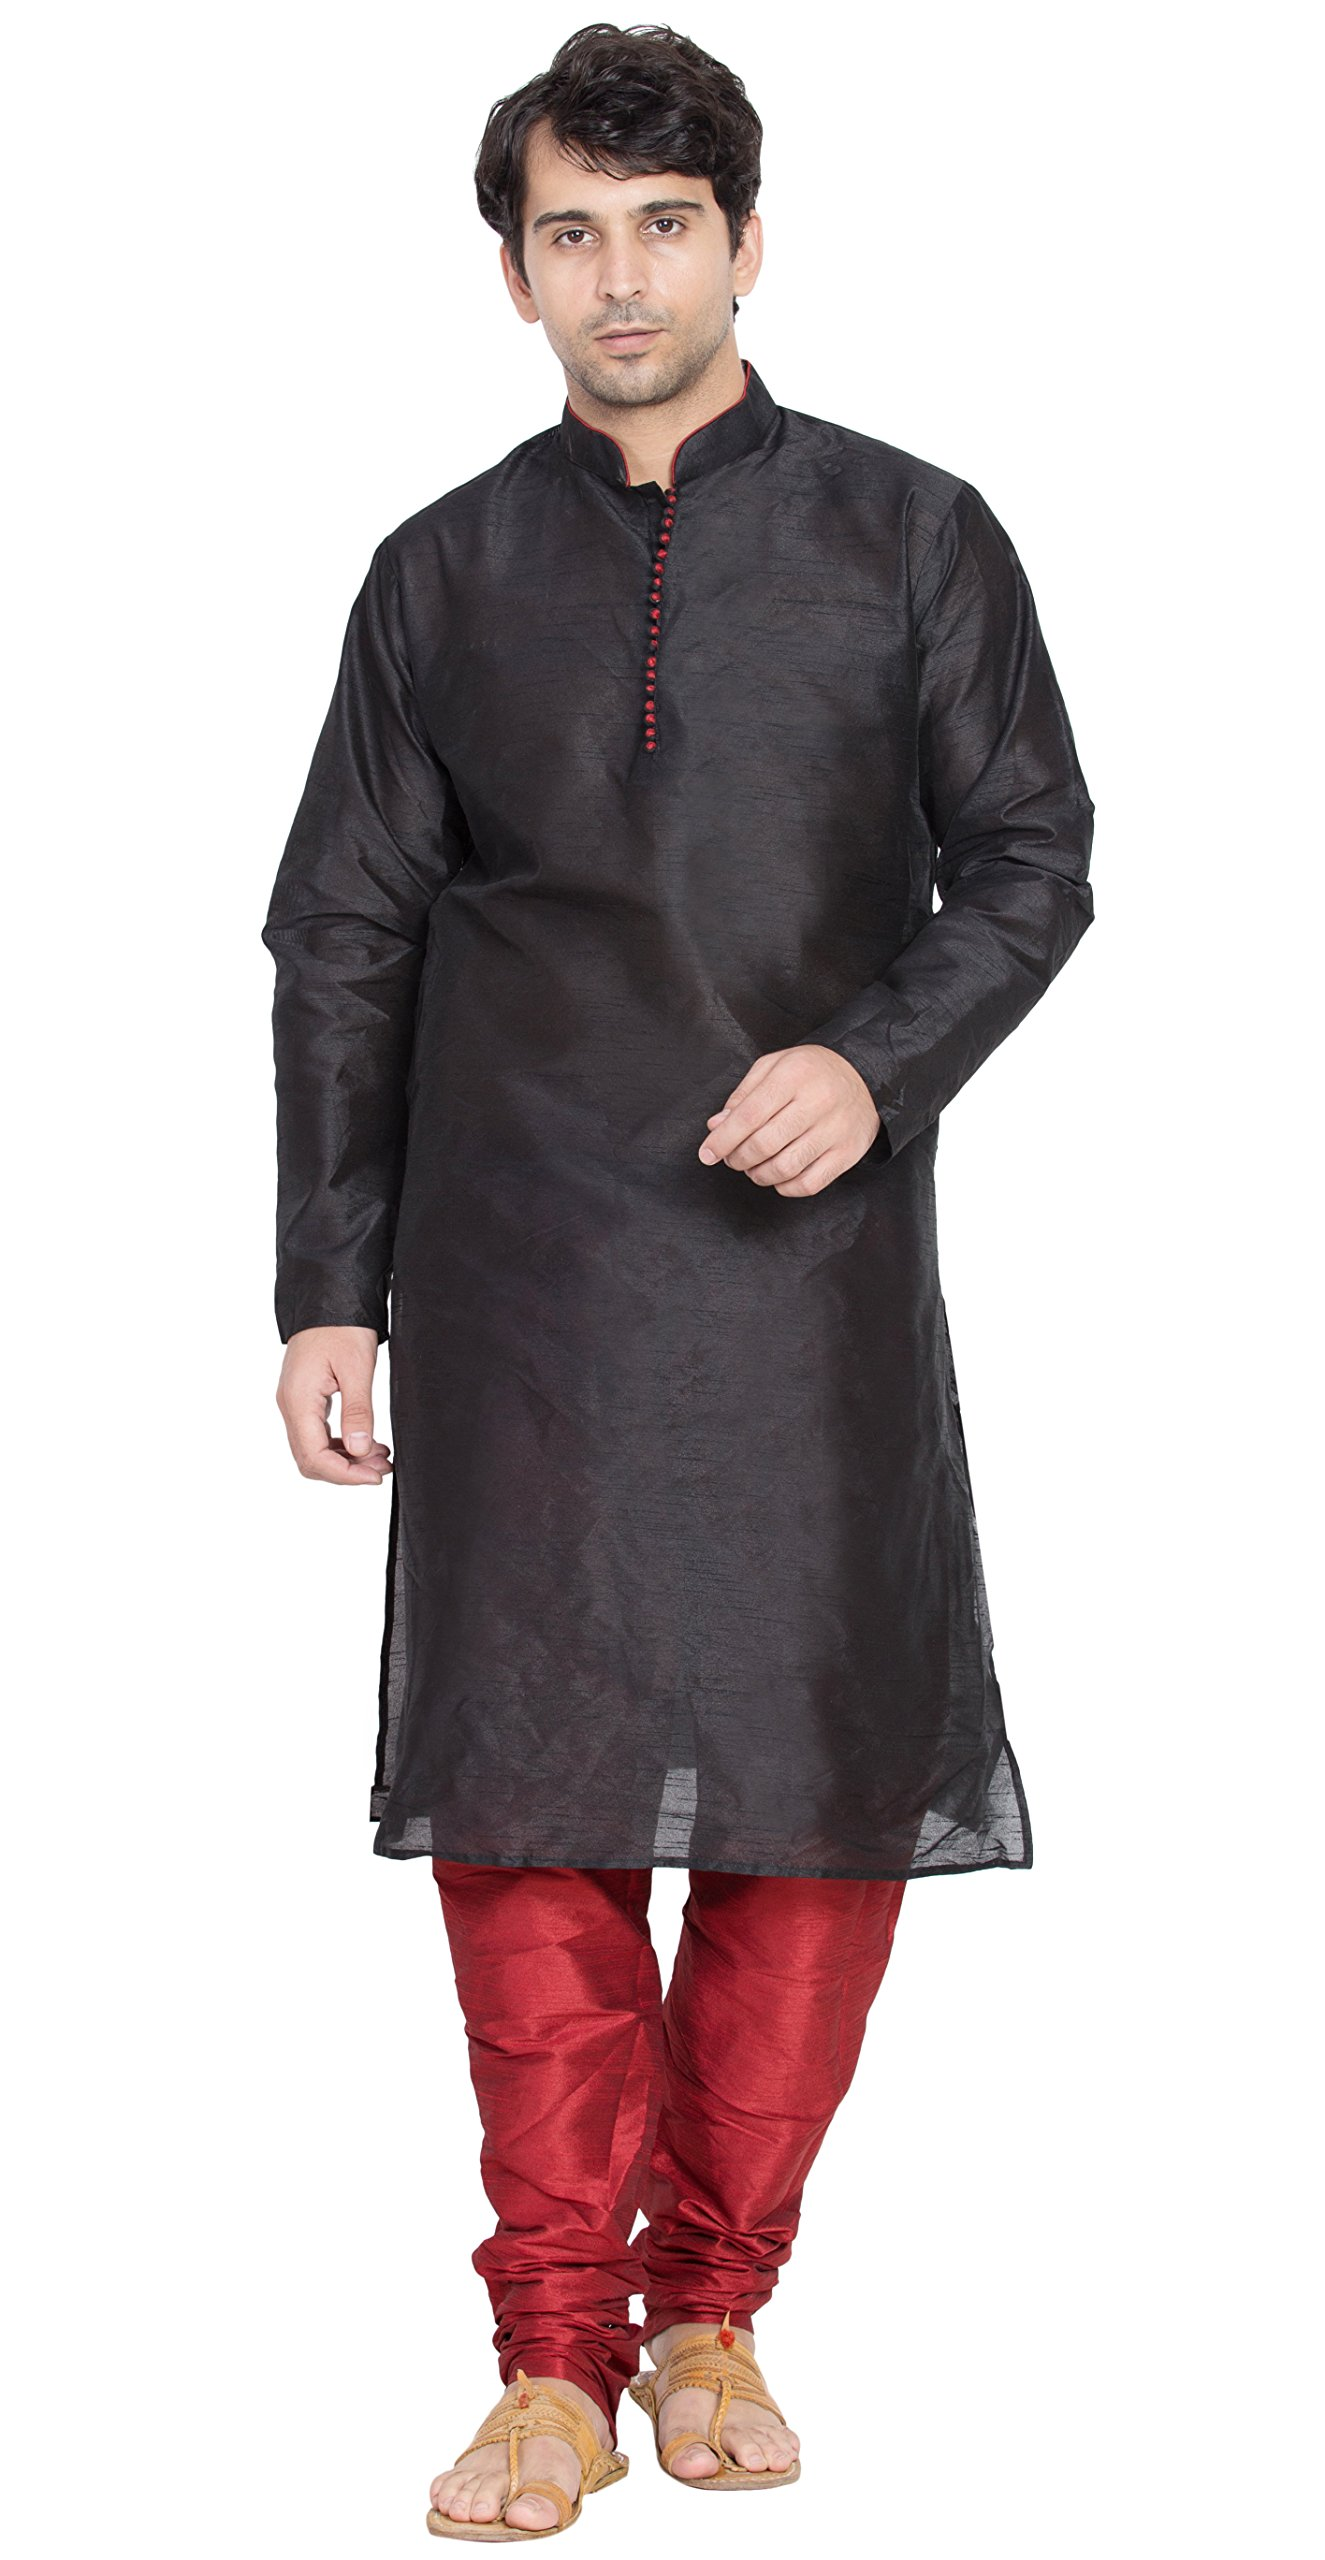 Black Kurta Pajama Indian Ethnic Long Sleeve Shirt Fashion Dress Casual Summer Clothing -XL